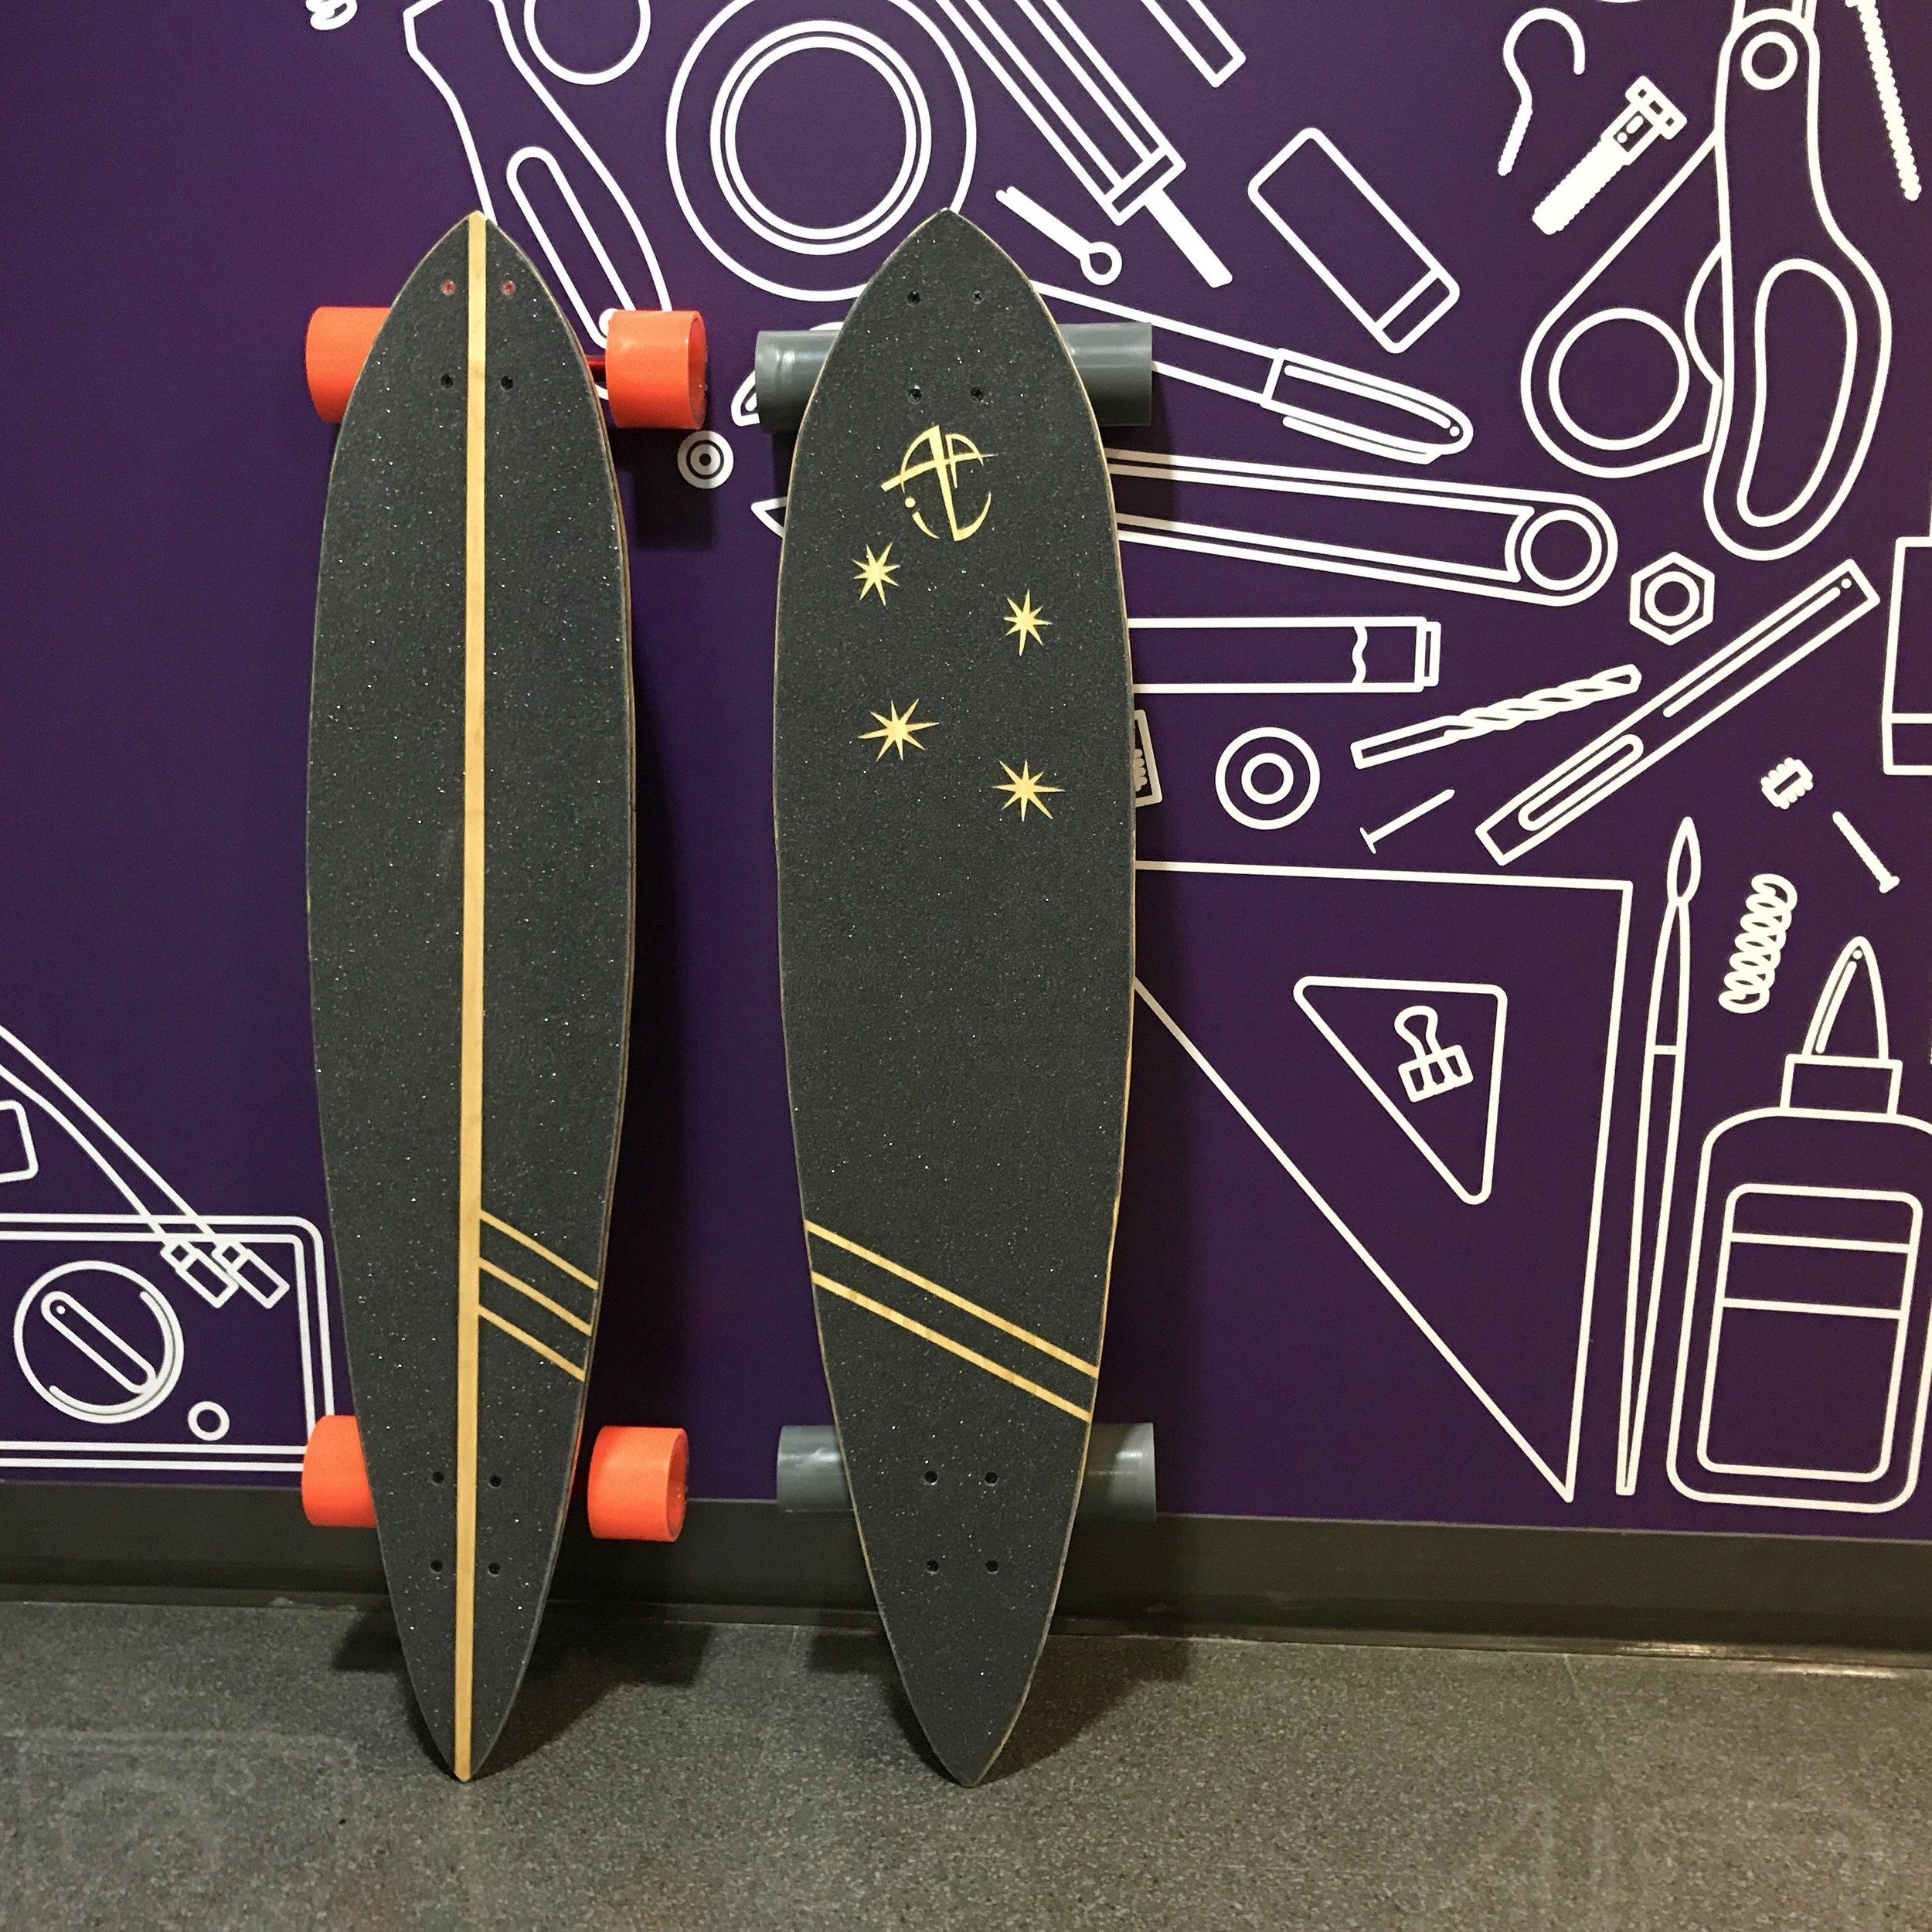 A custom grip tape pattern was hand cut for each board.